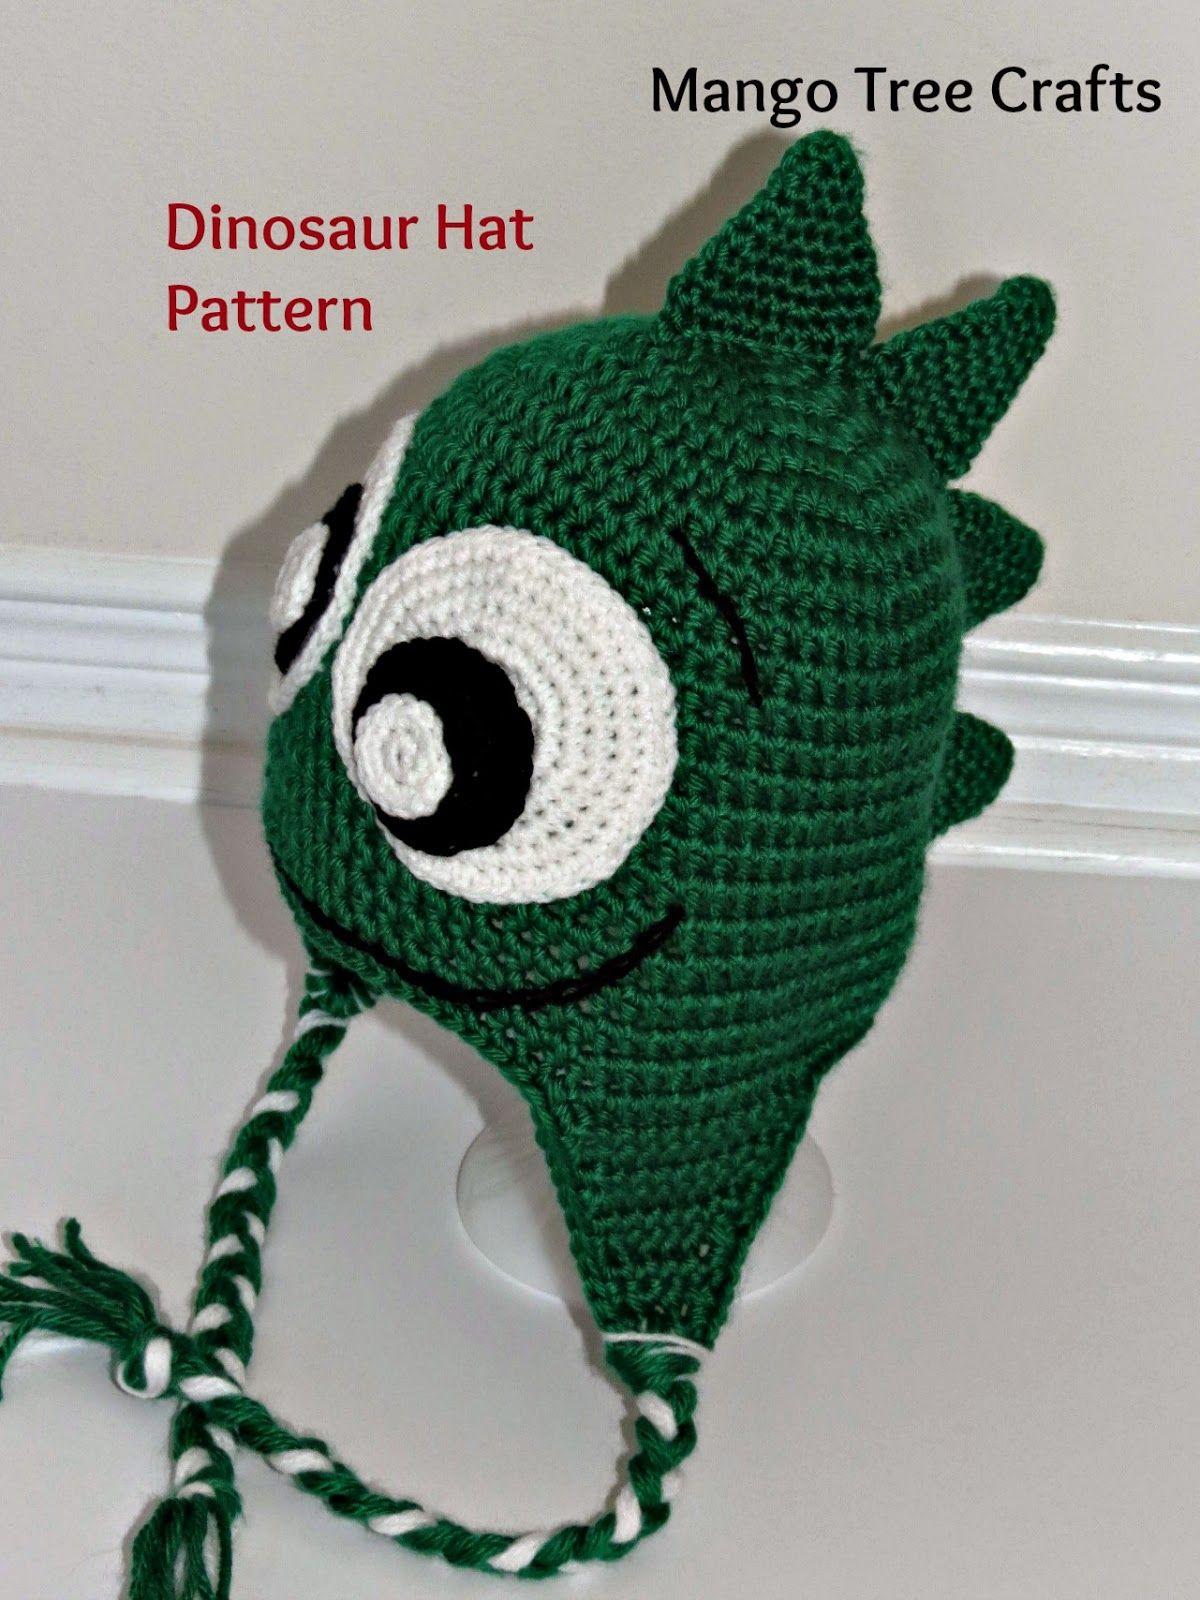 FREE Pattern - Dinosaur earflap hat | Crocheting and knitting ...